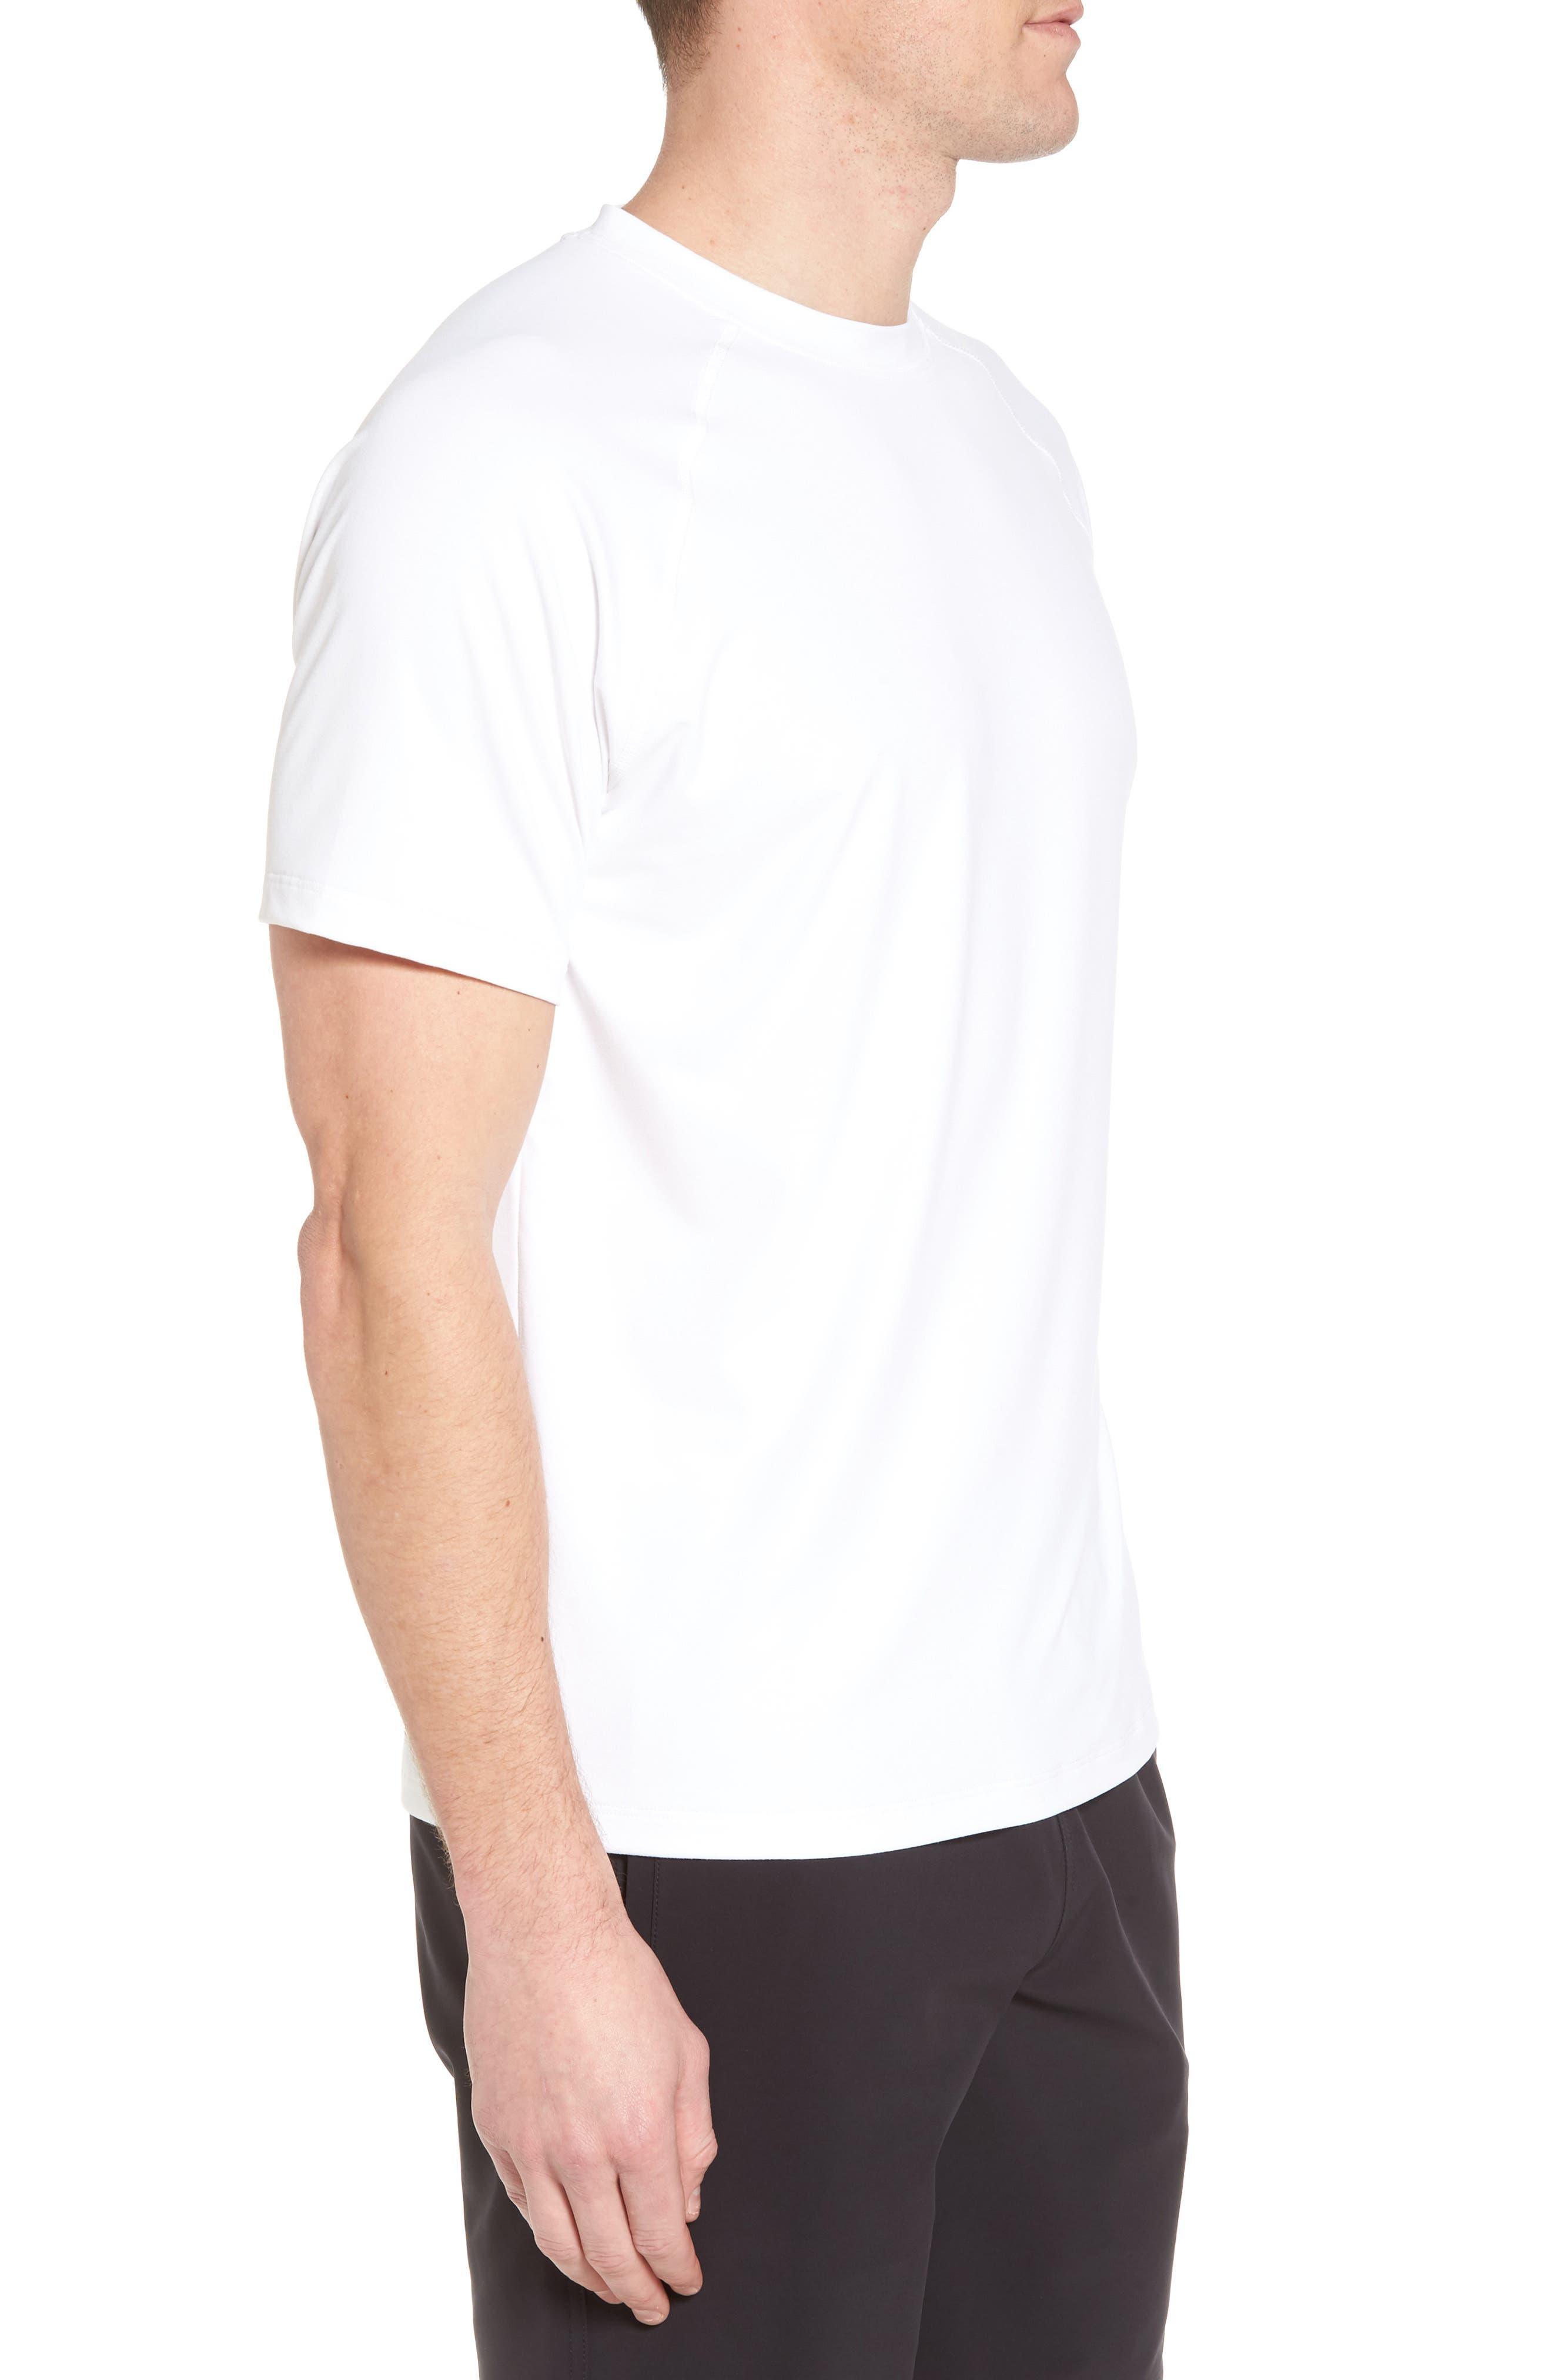 Rio Regular Fit Technical T-Shirt,                             Alternate thumbnail 3, color,                             White